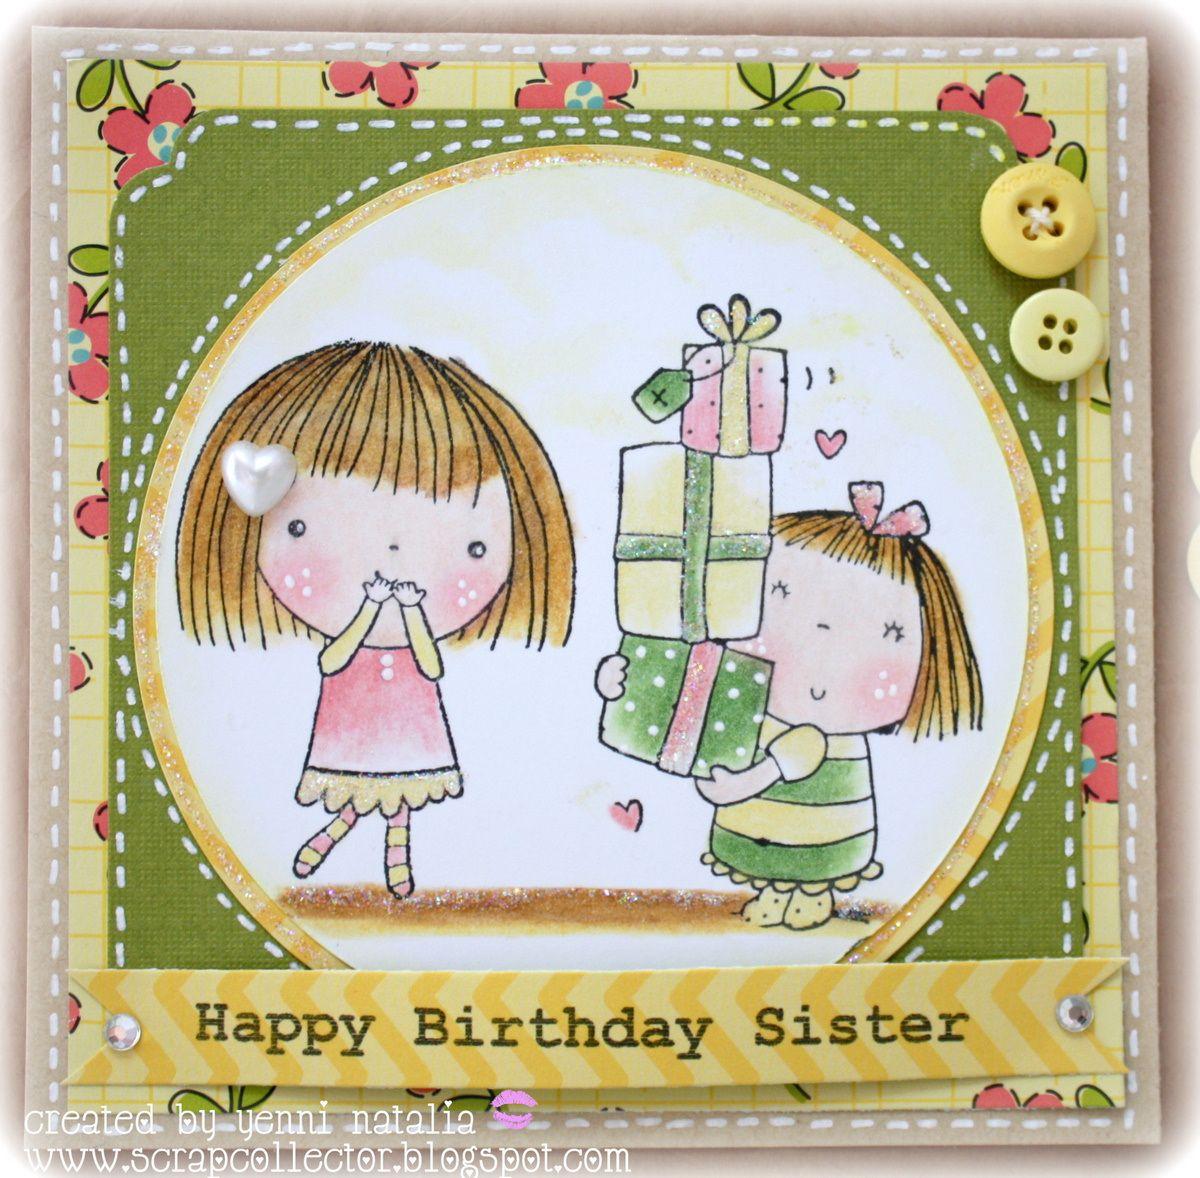 Handmade birthday greeting cards for sister happy birthday sister handmade birthday greeting cards for sister happy birthday sister kristyandbryce Choice Image